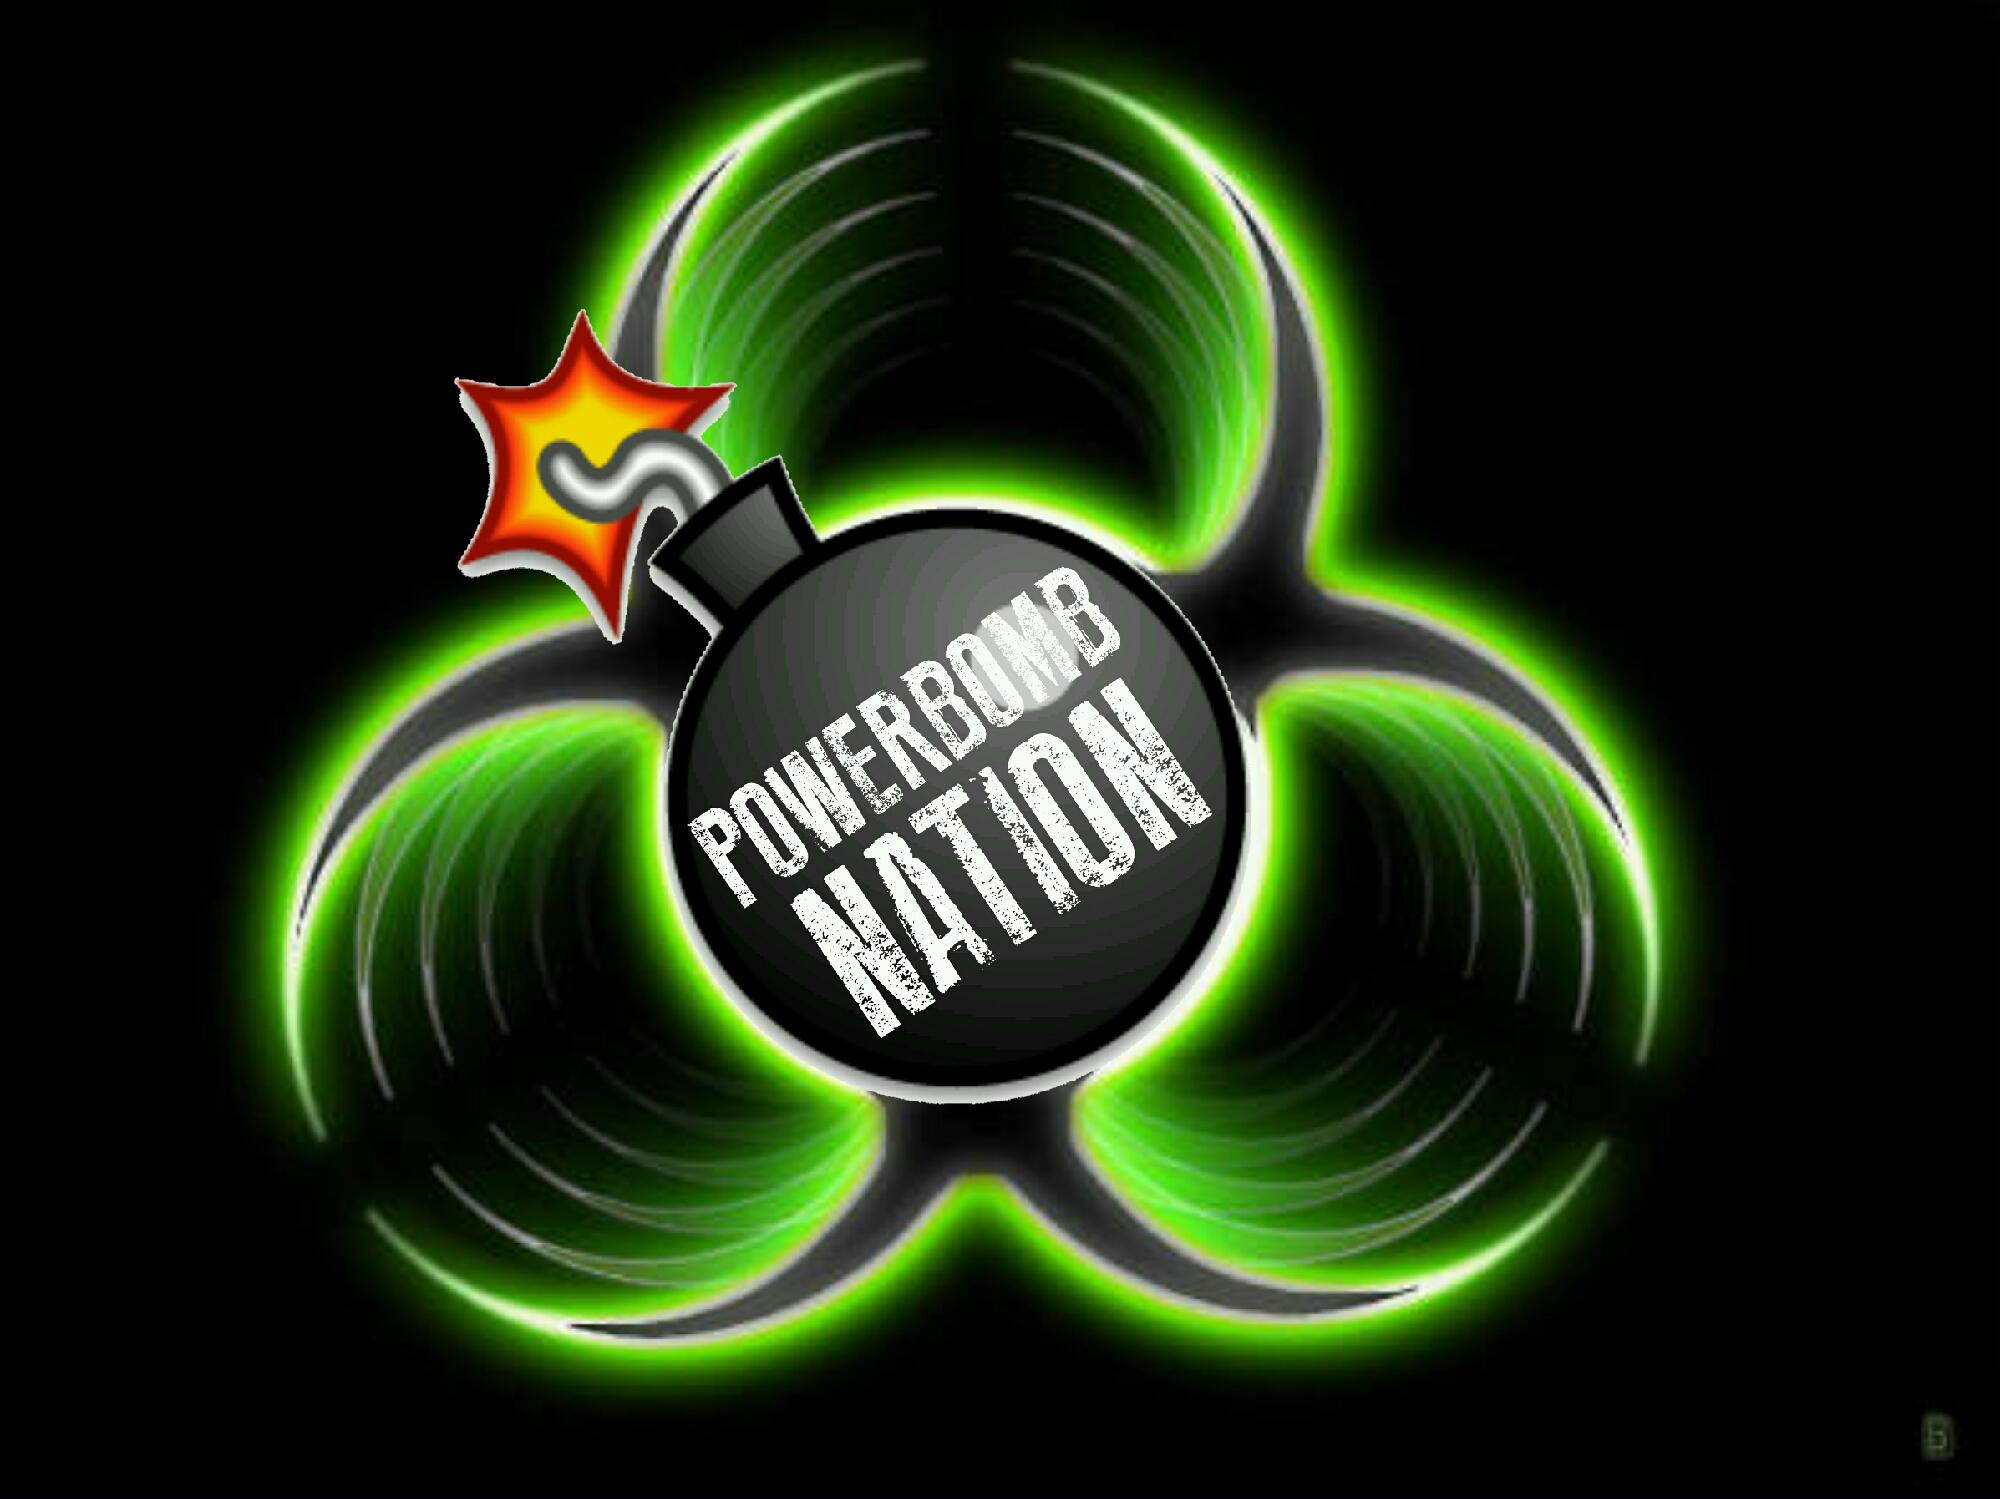 PowerBomb Nation